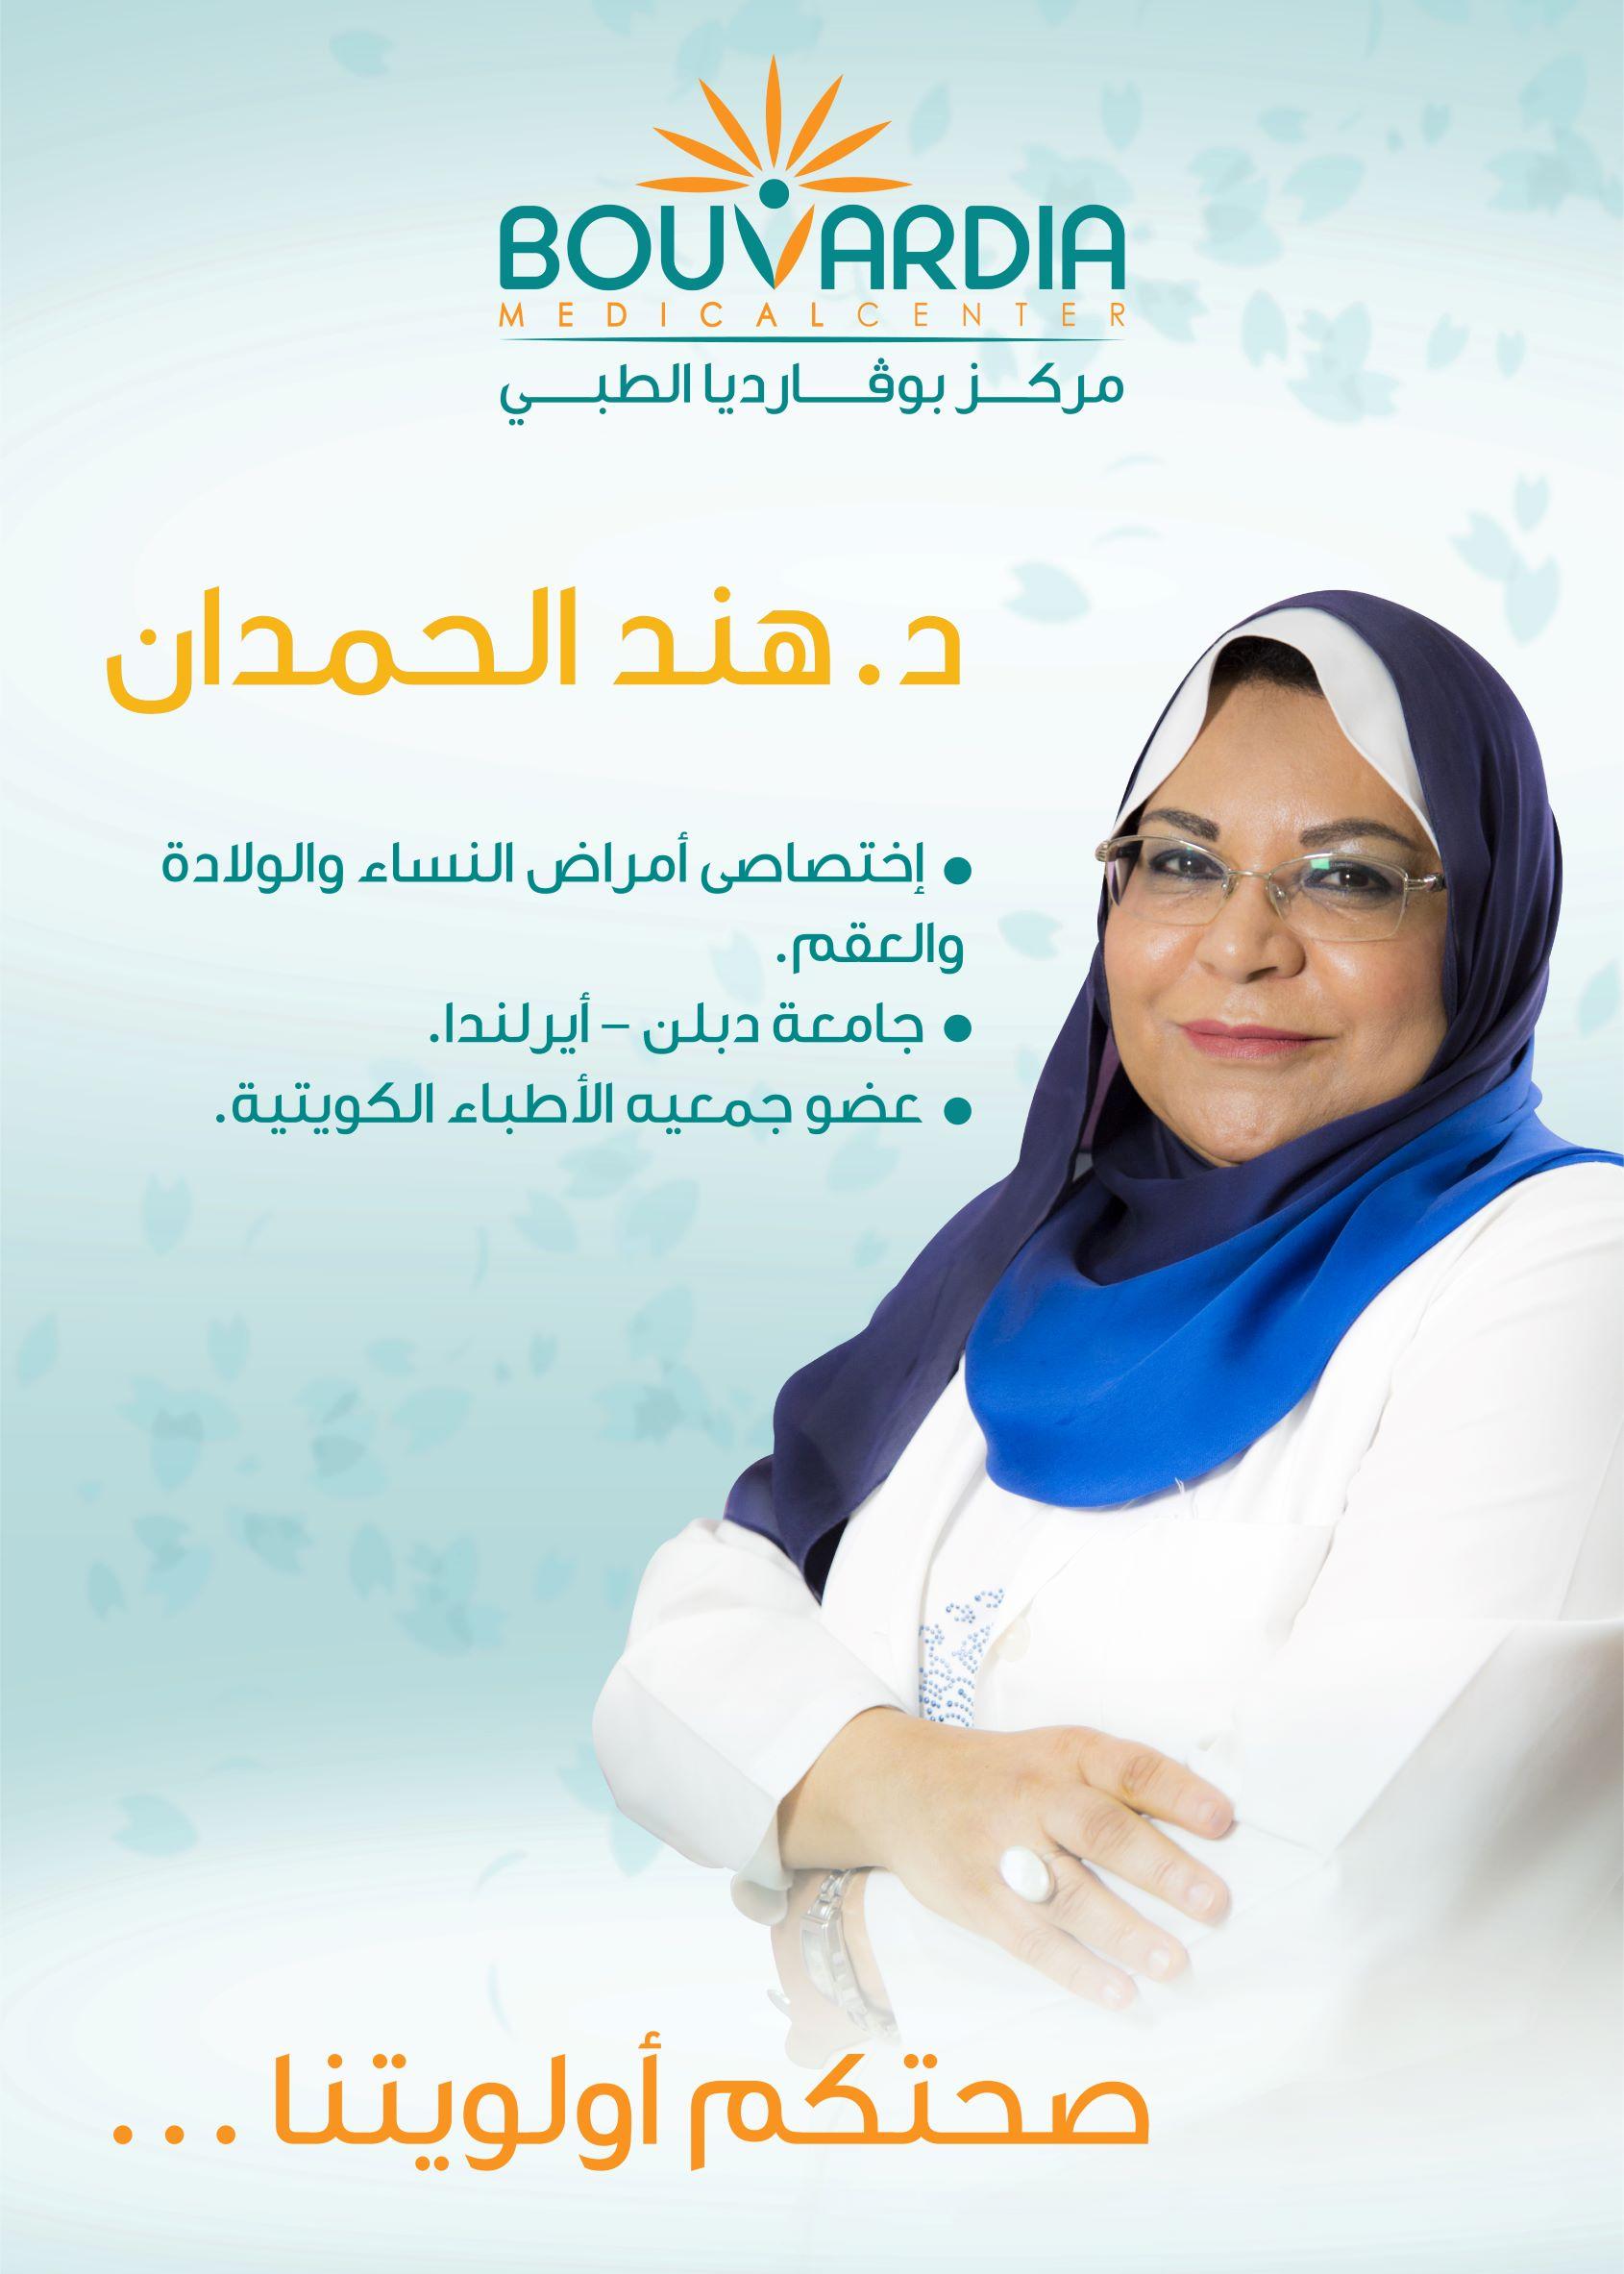 2Hind Al-Hemdan